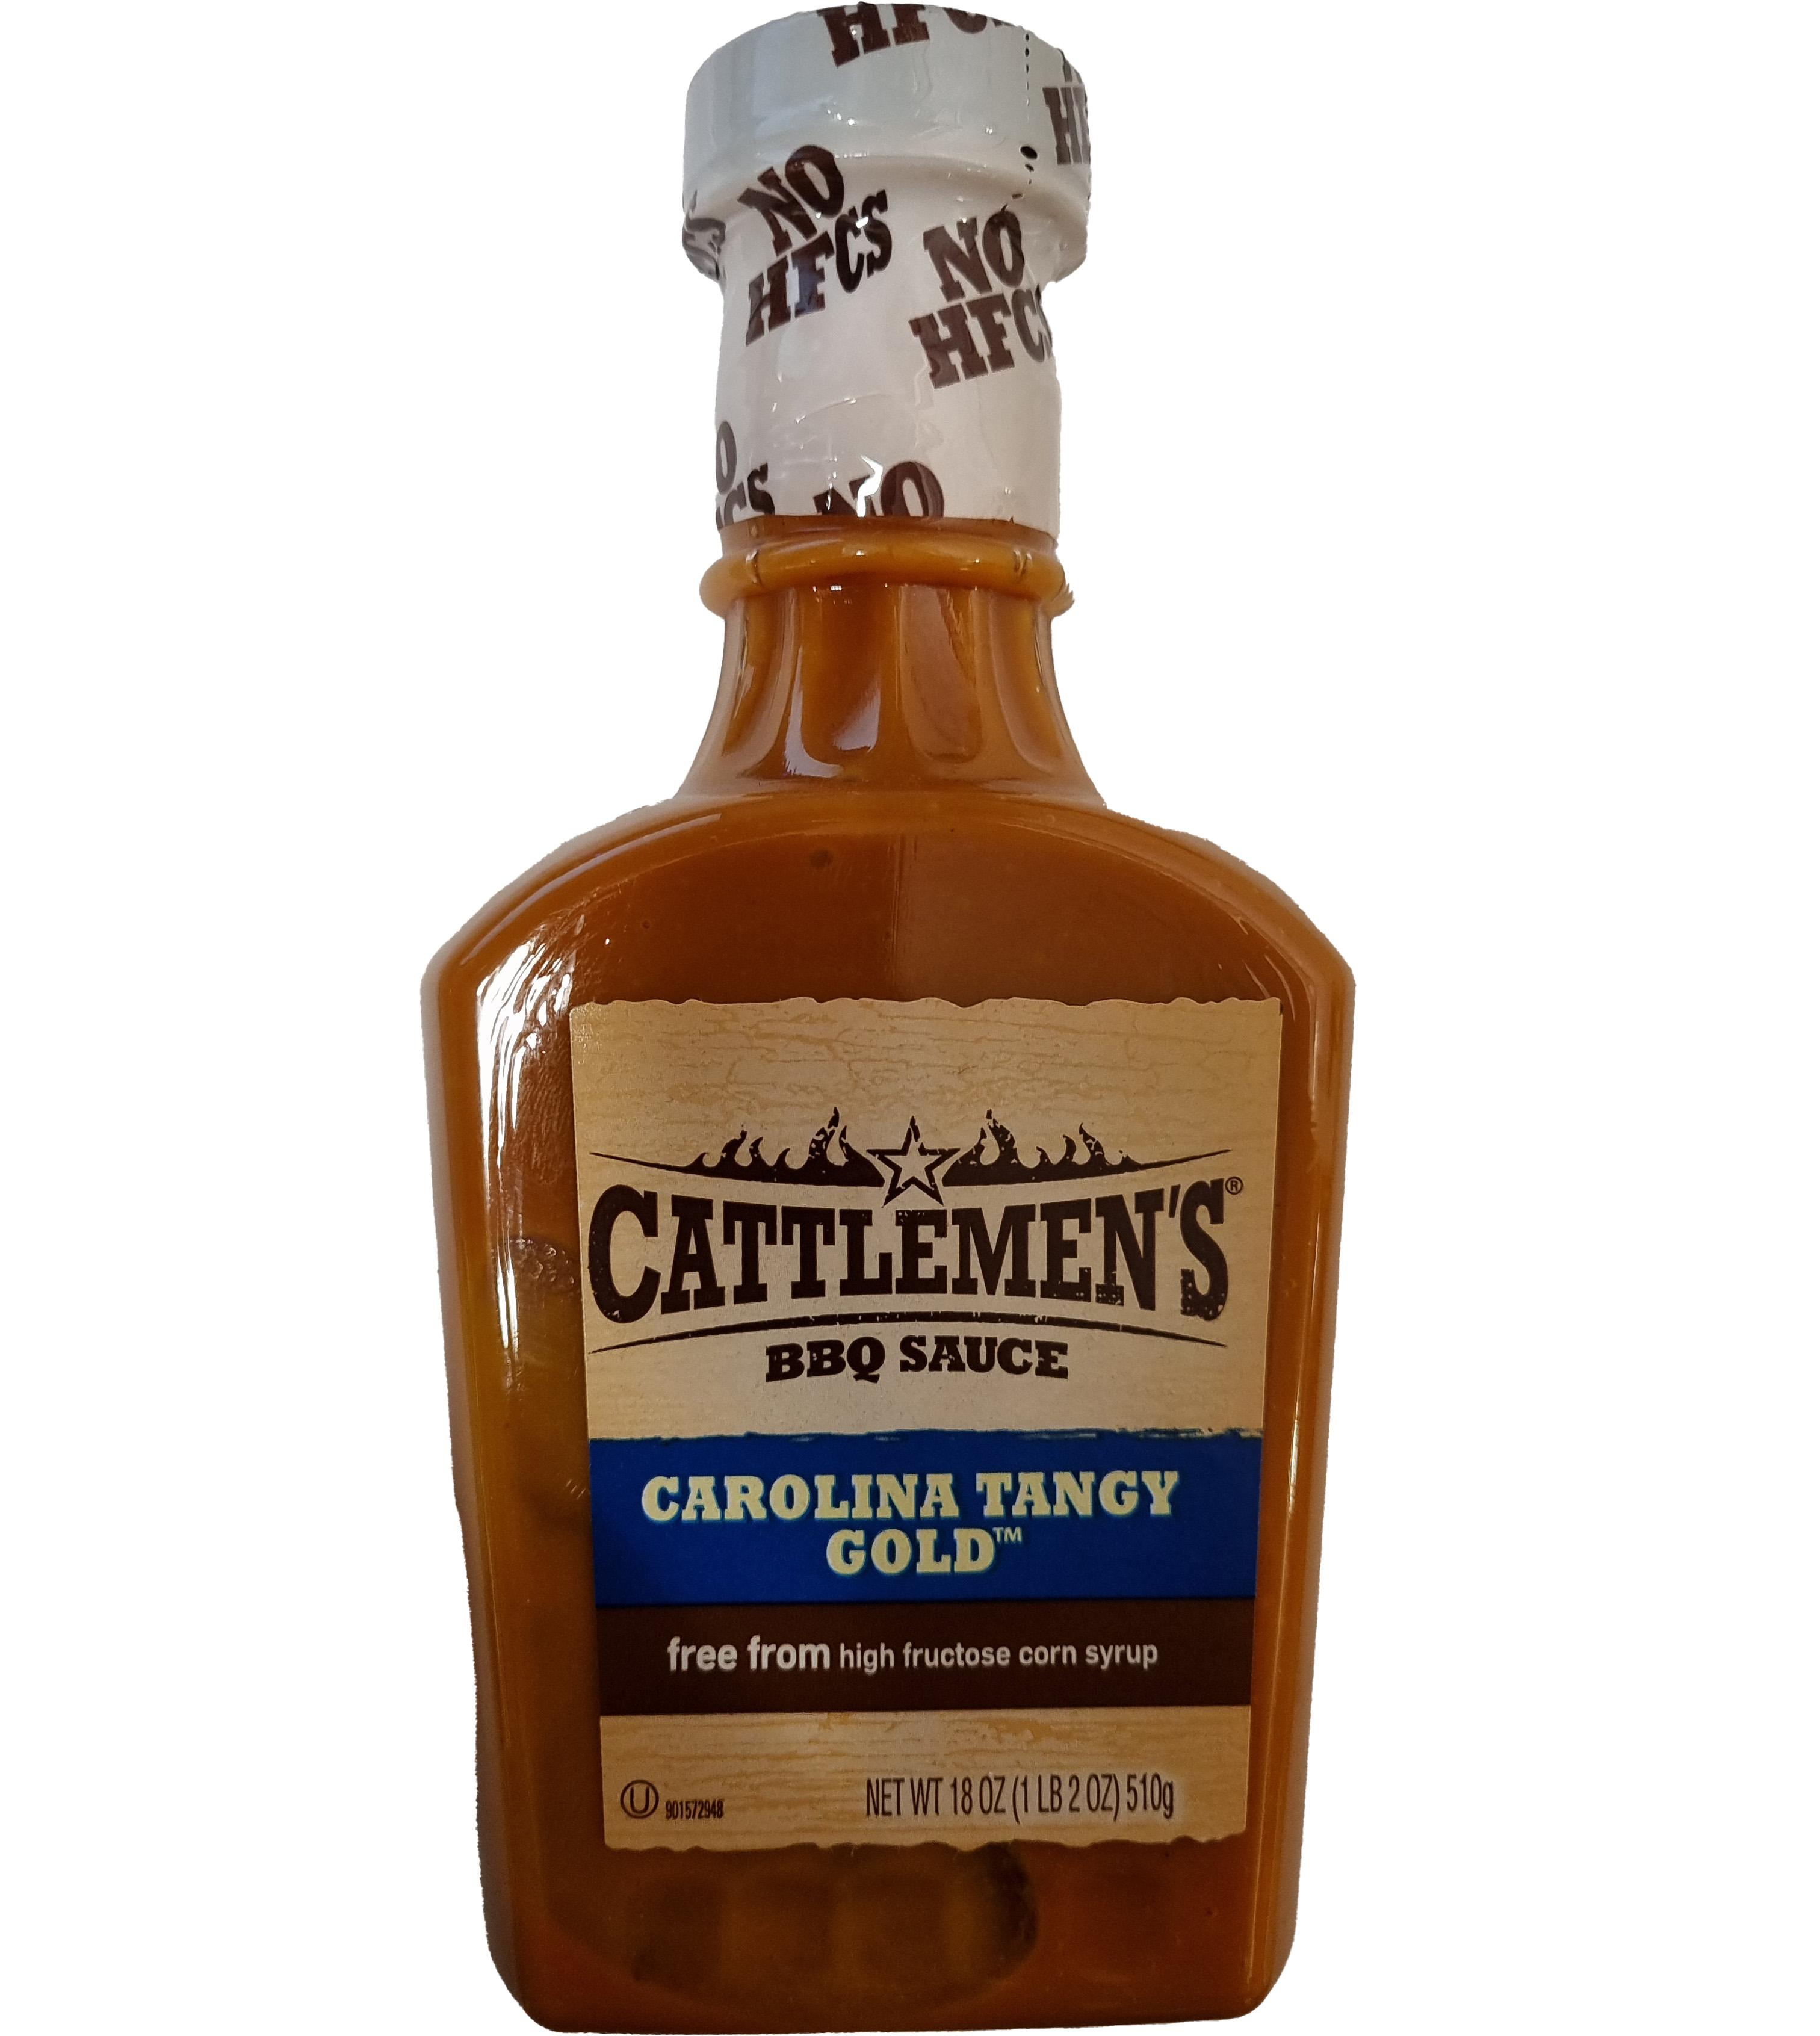 Cattlemen's Carolina Tangy Gold BBQ Sauce 510 g (MHD 18.04.21)